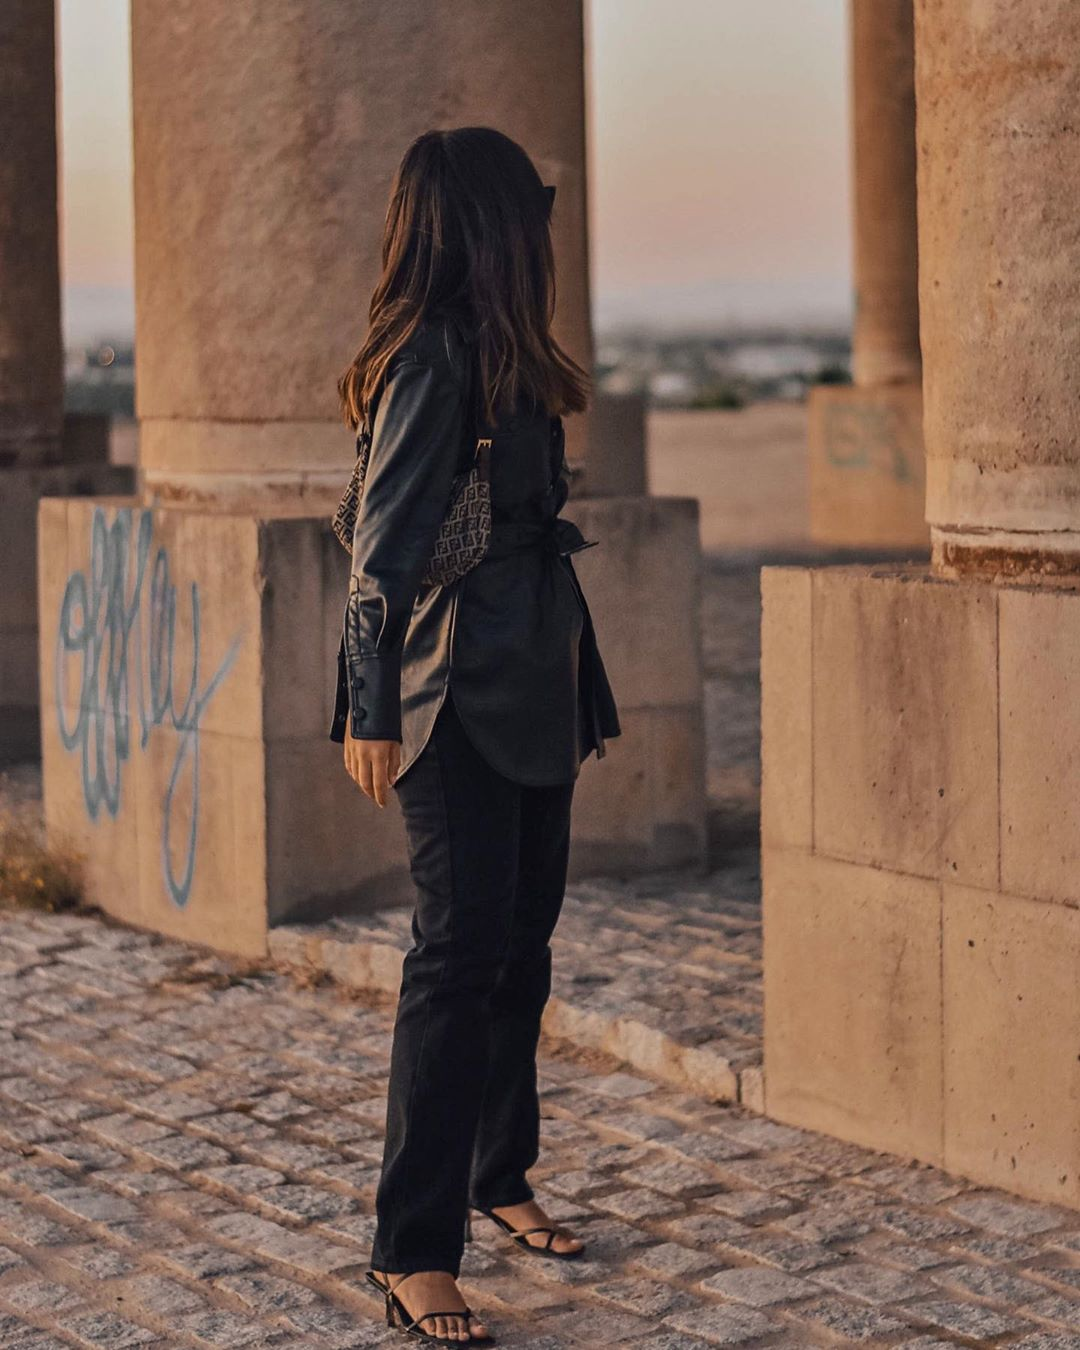 synthetic leather jacket de Zara sur andreaccerezo